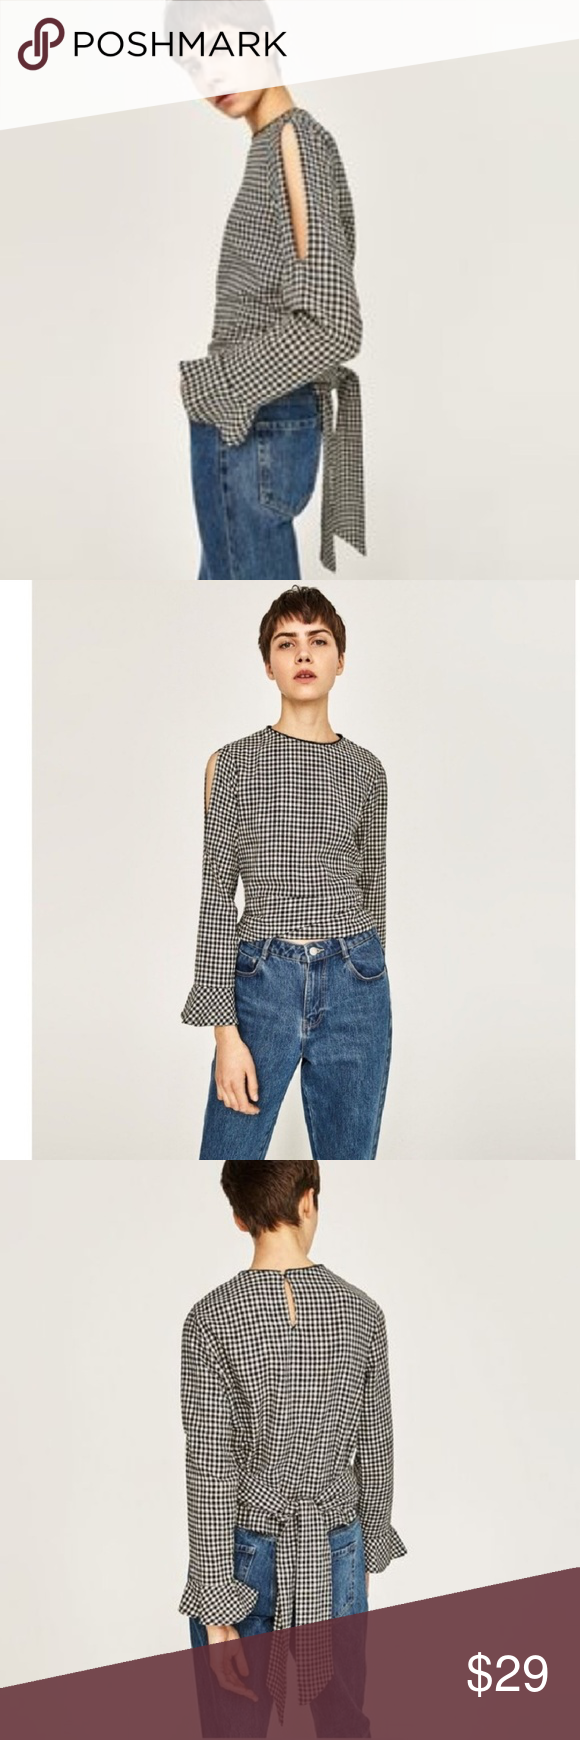 aff5f42dc46f6f Zara Basic black gingham cold shoulder blouse Zara Basic blouse in black gingham  print featuring long